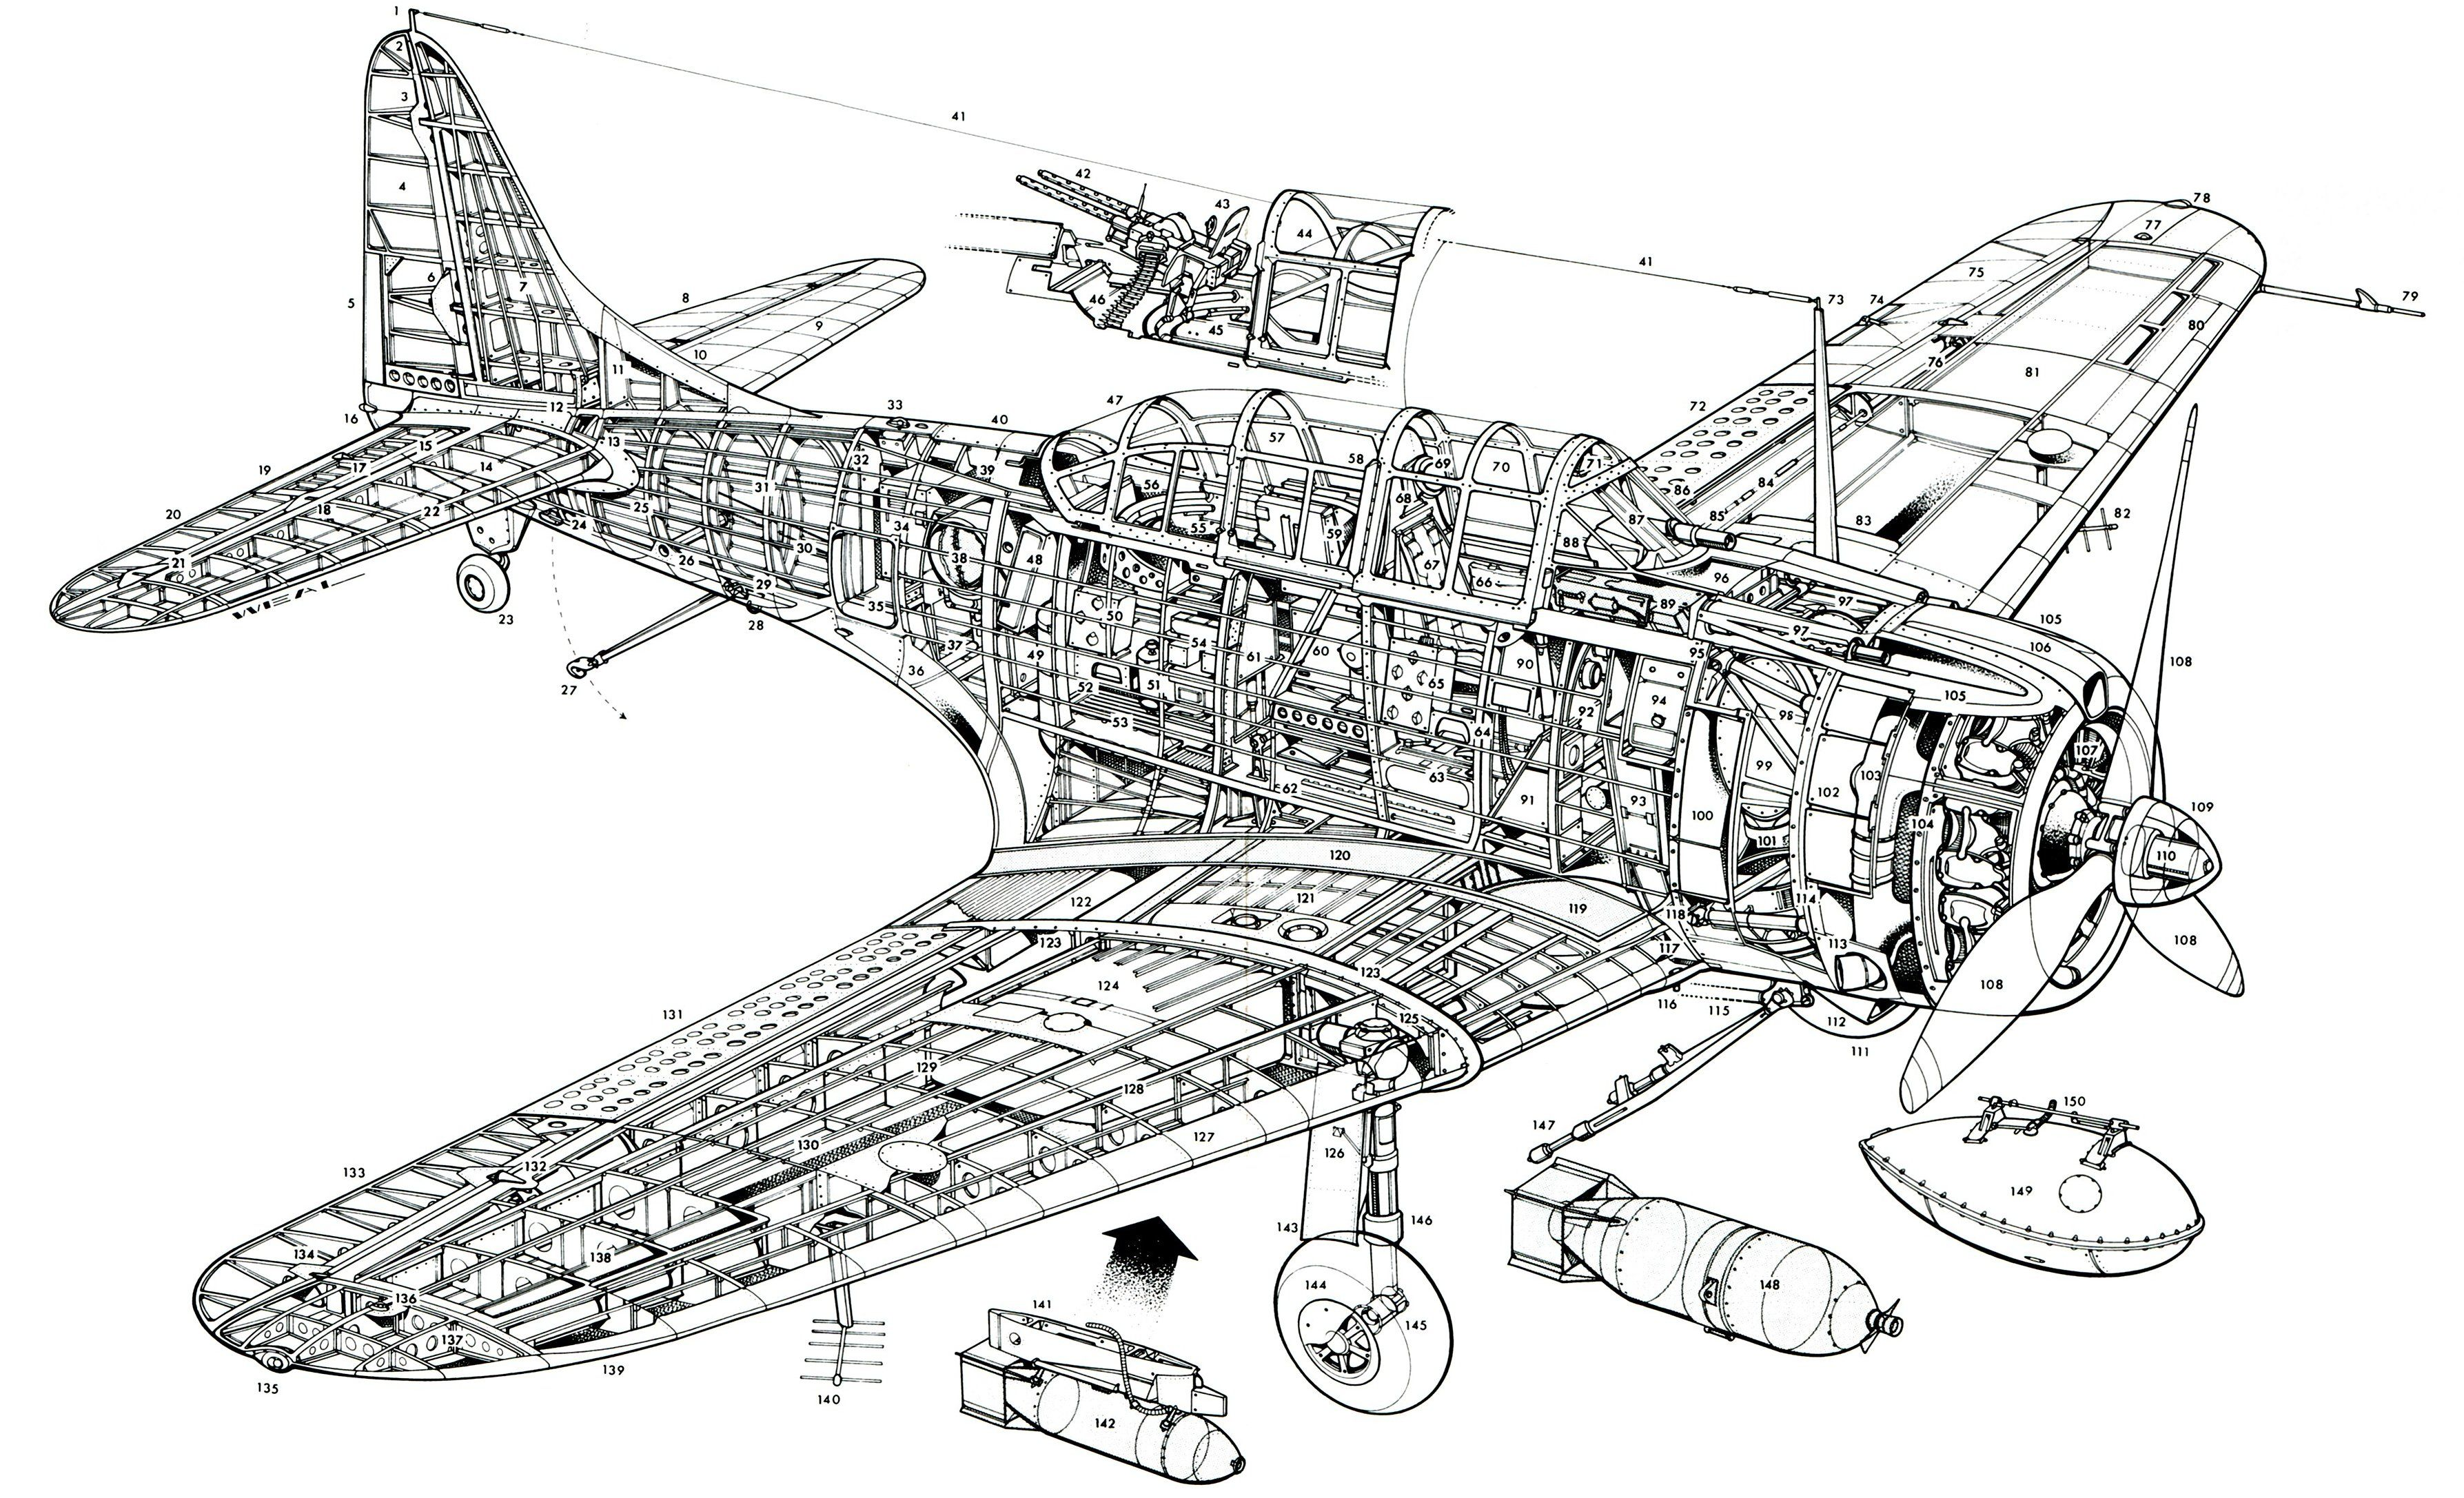 http://references.charlyecho.com/Aviation/Douglas/SBD